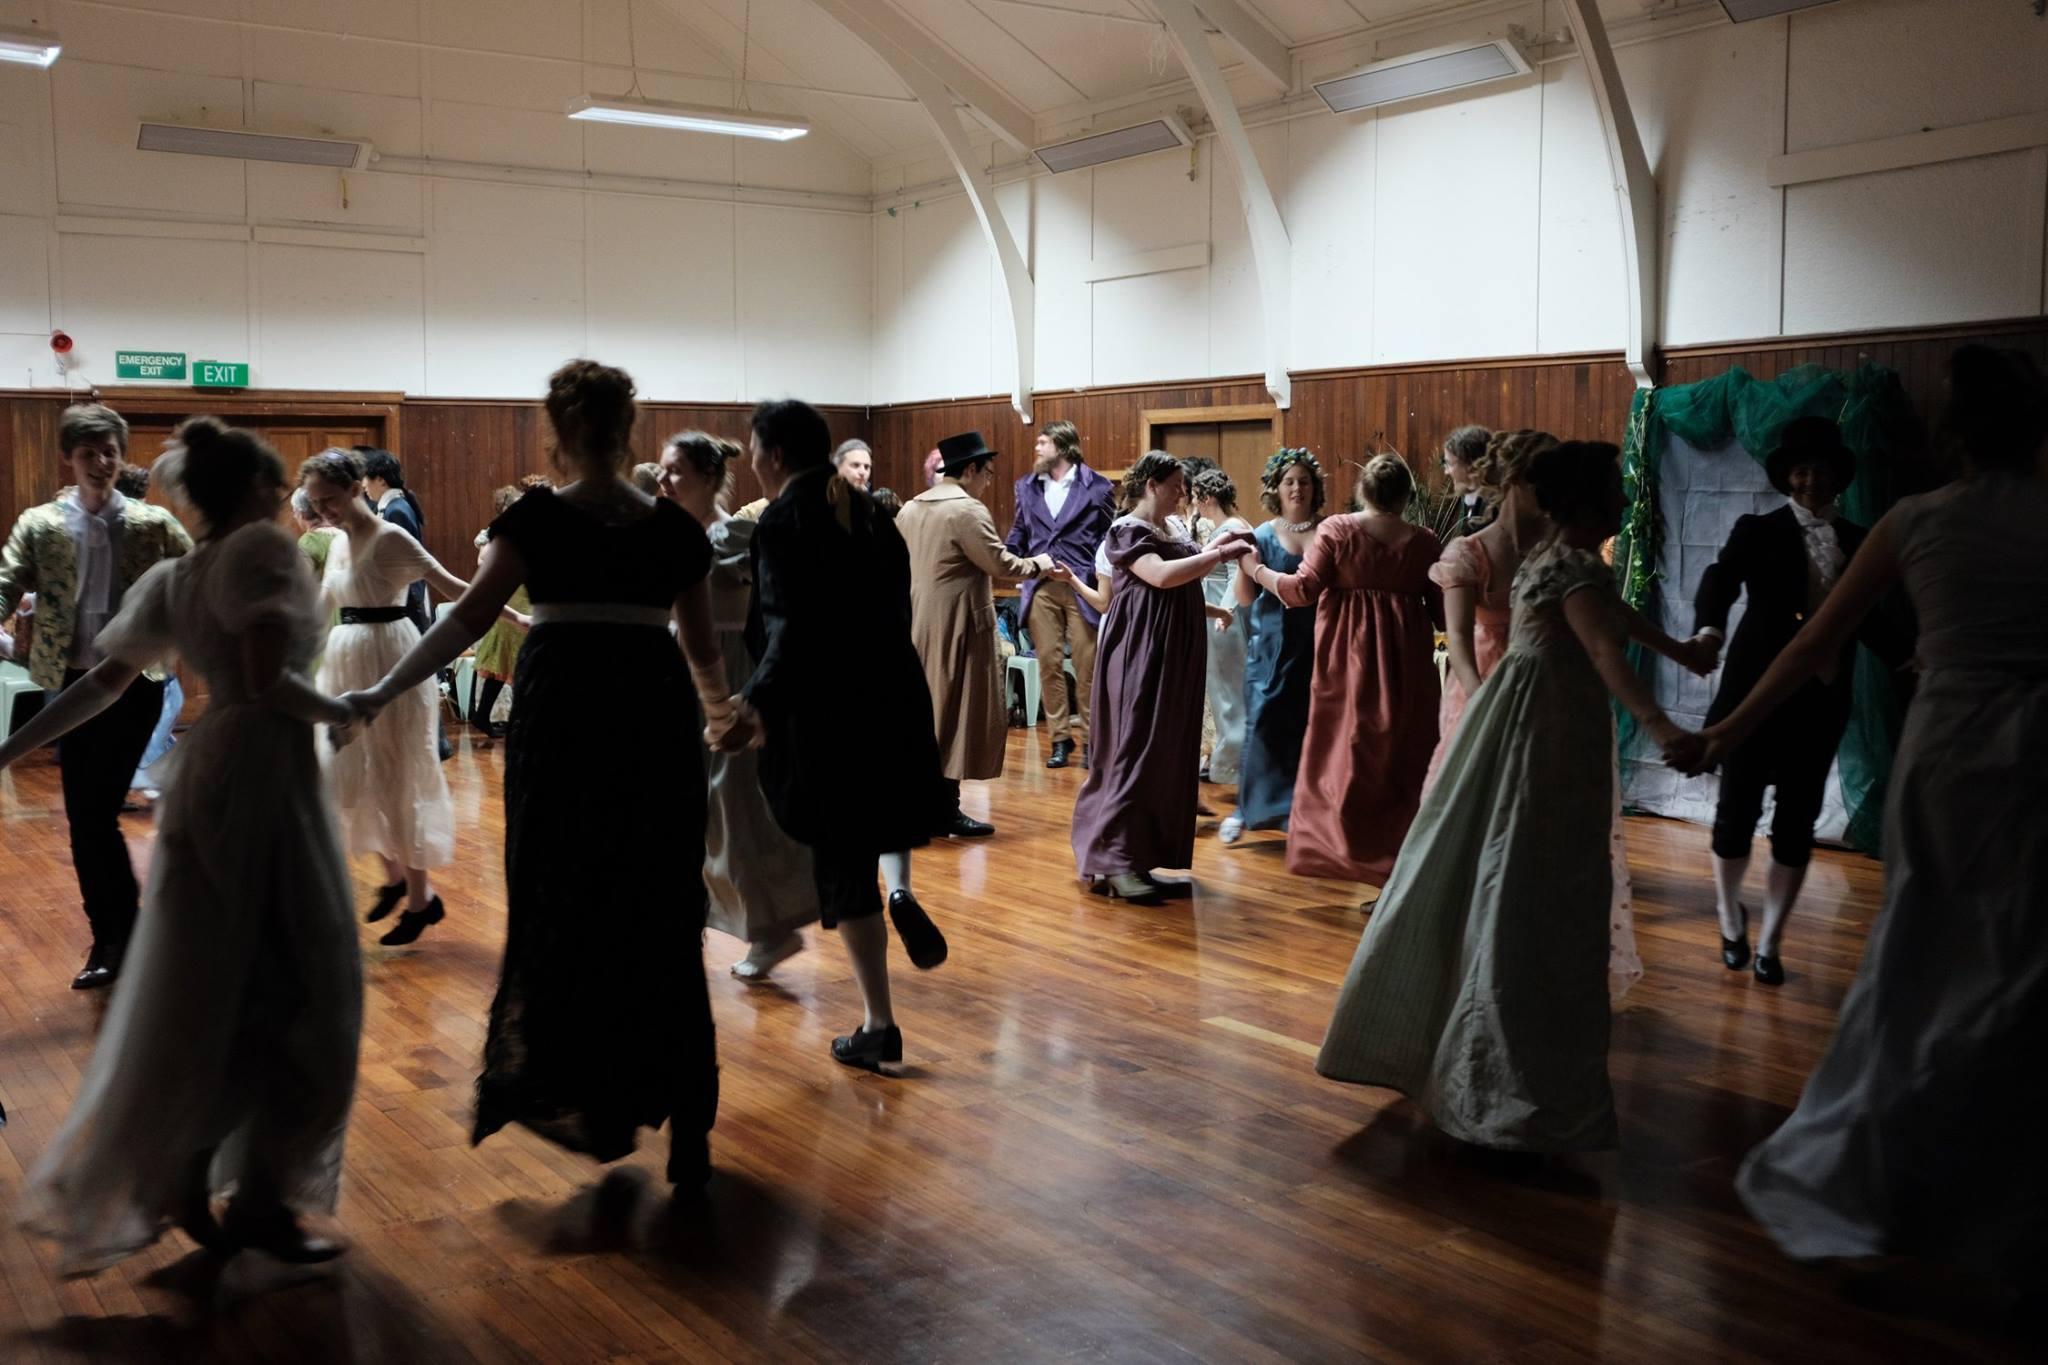 Midwinter Regency Ball